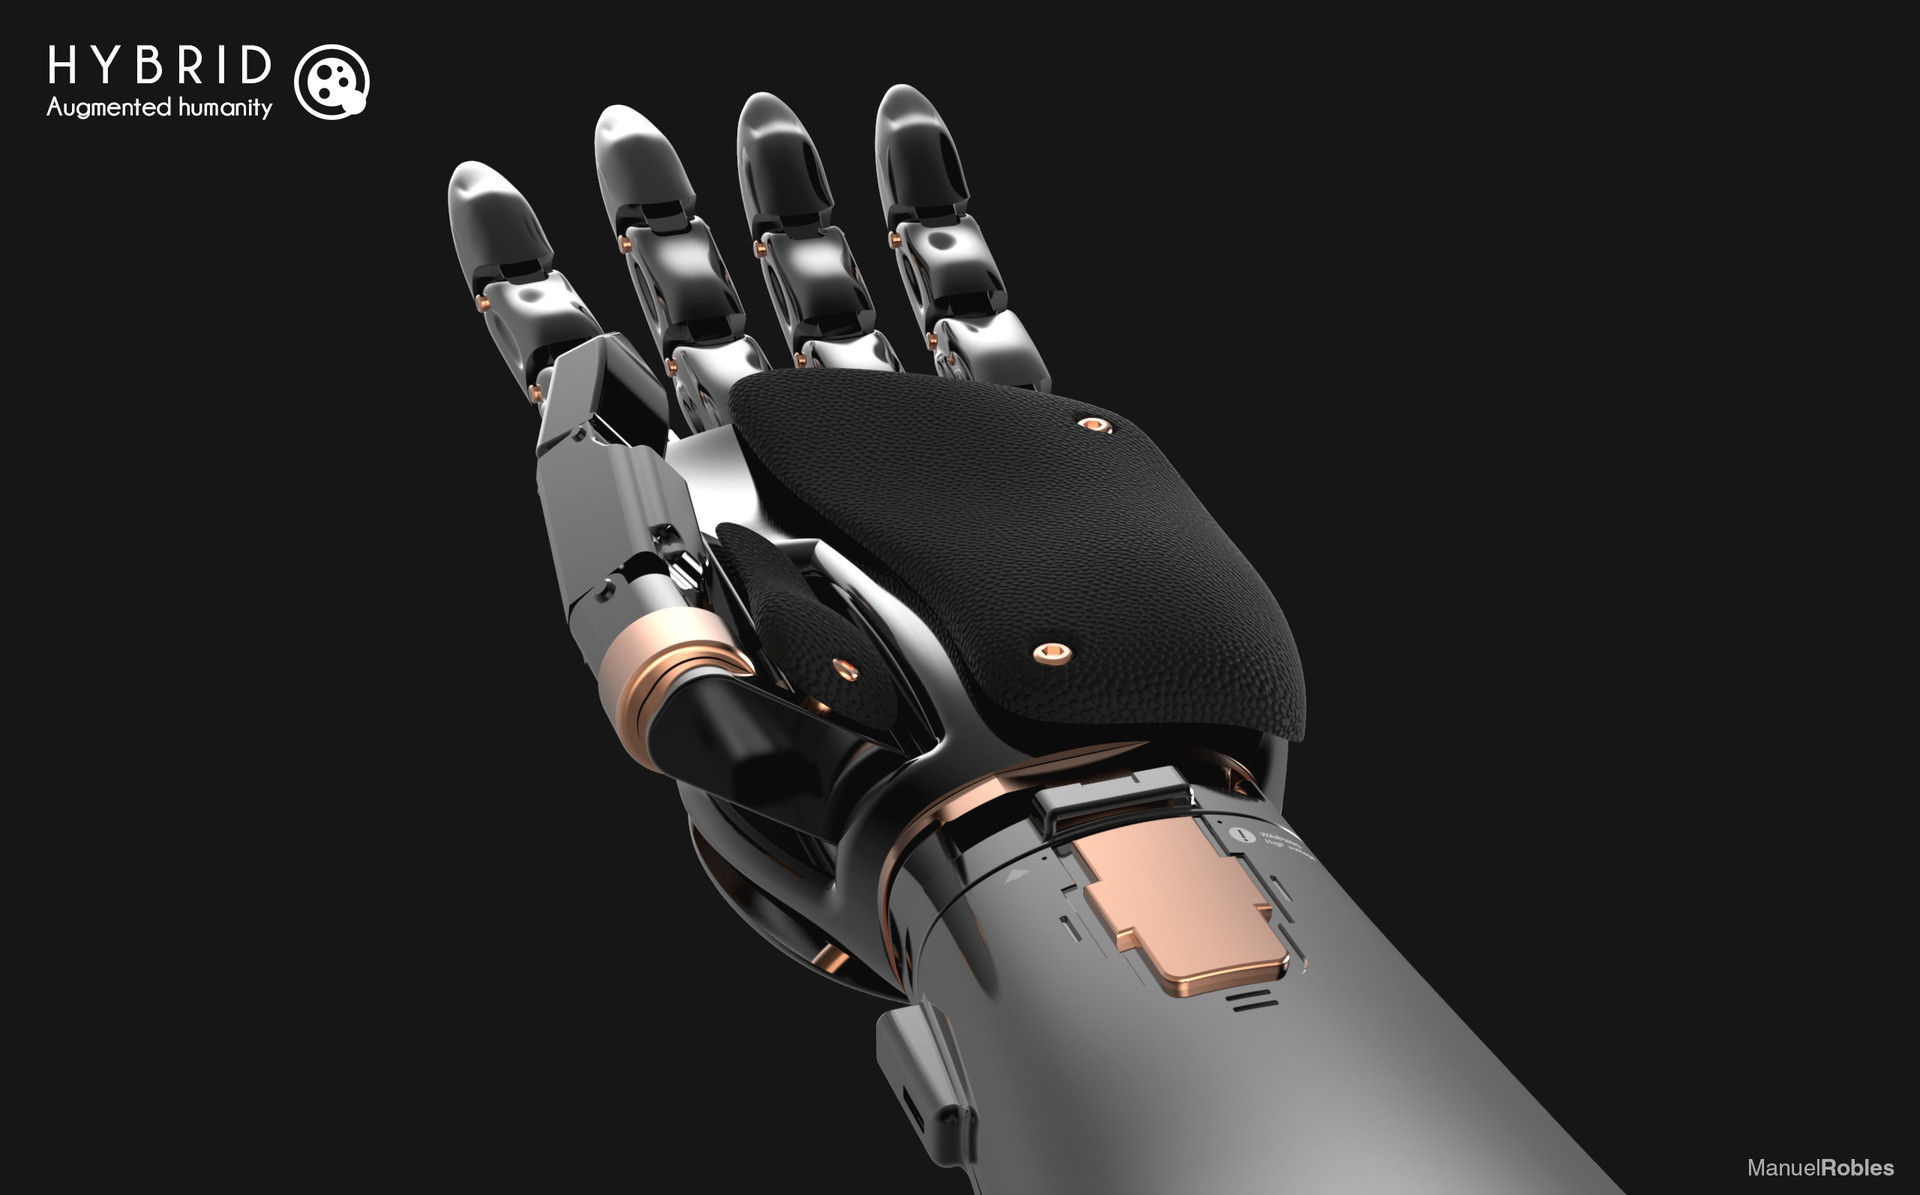 Manuel robles robot arm keyshot 07